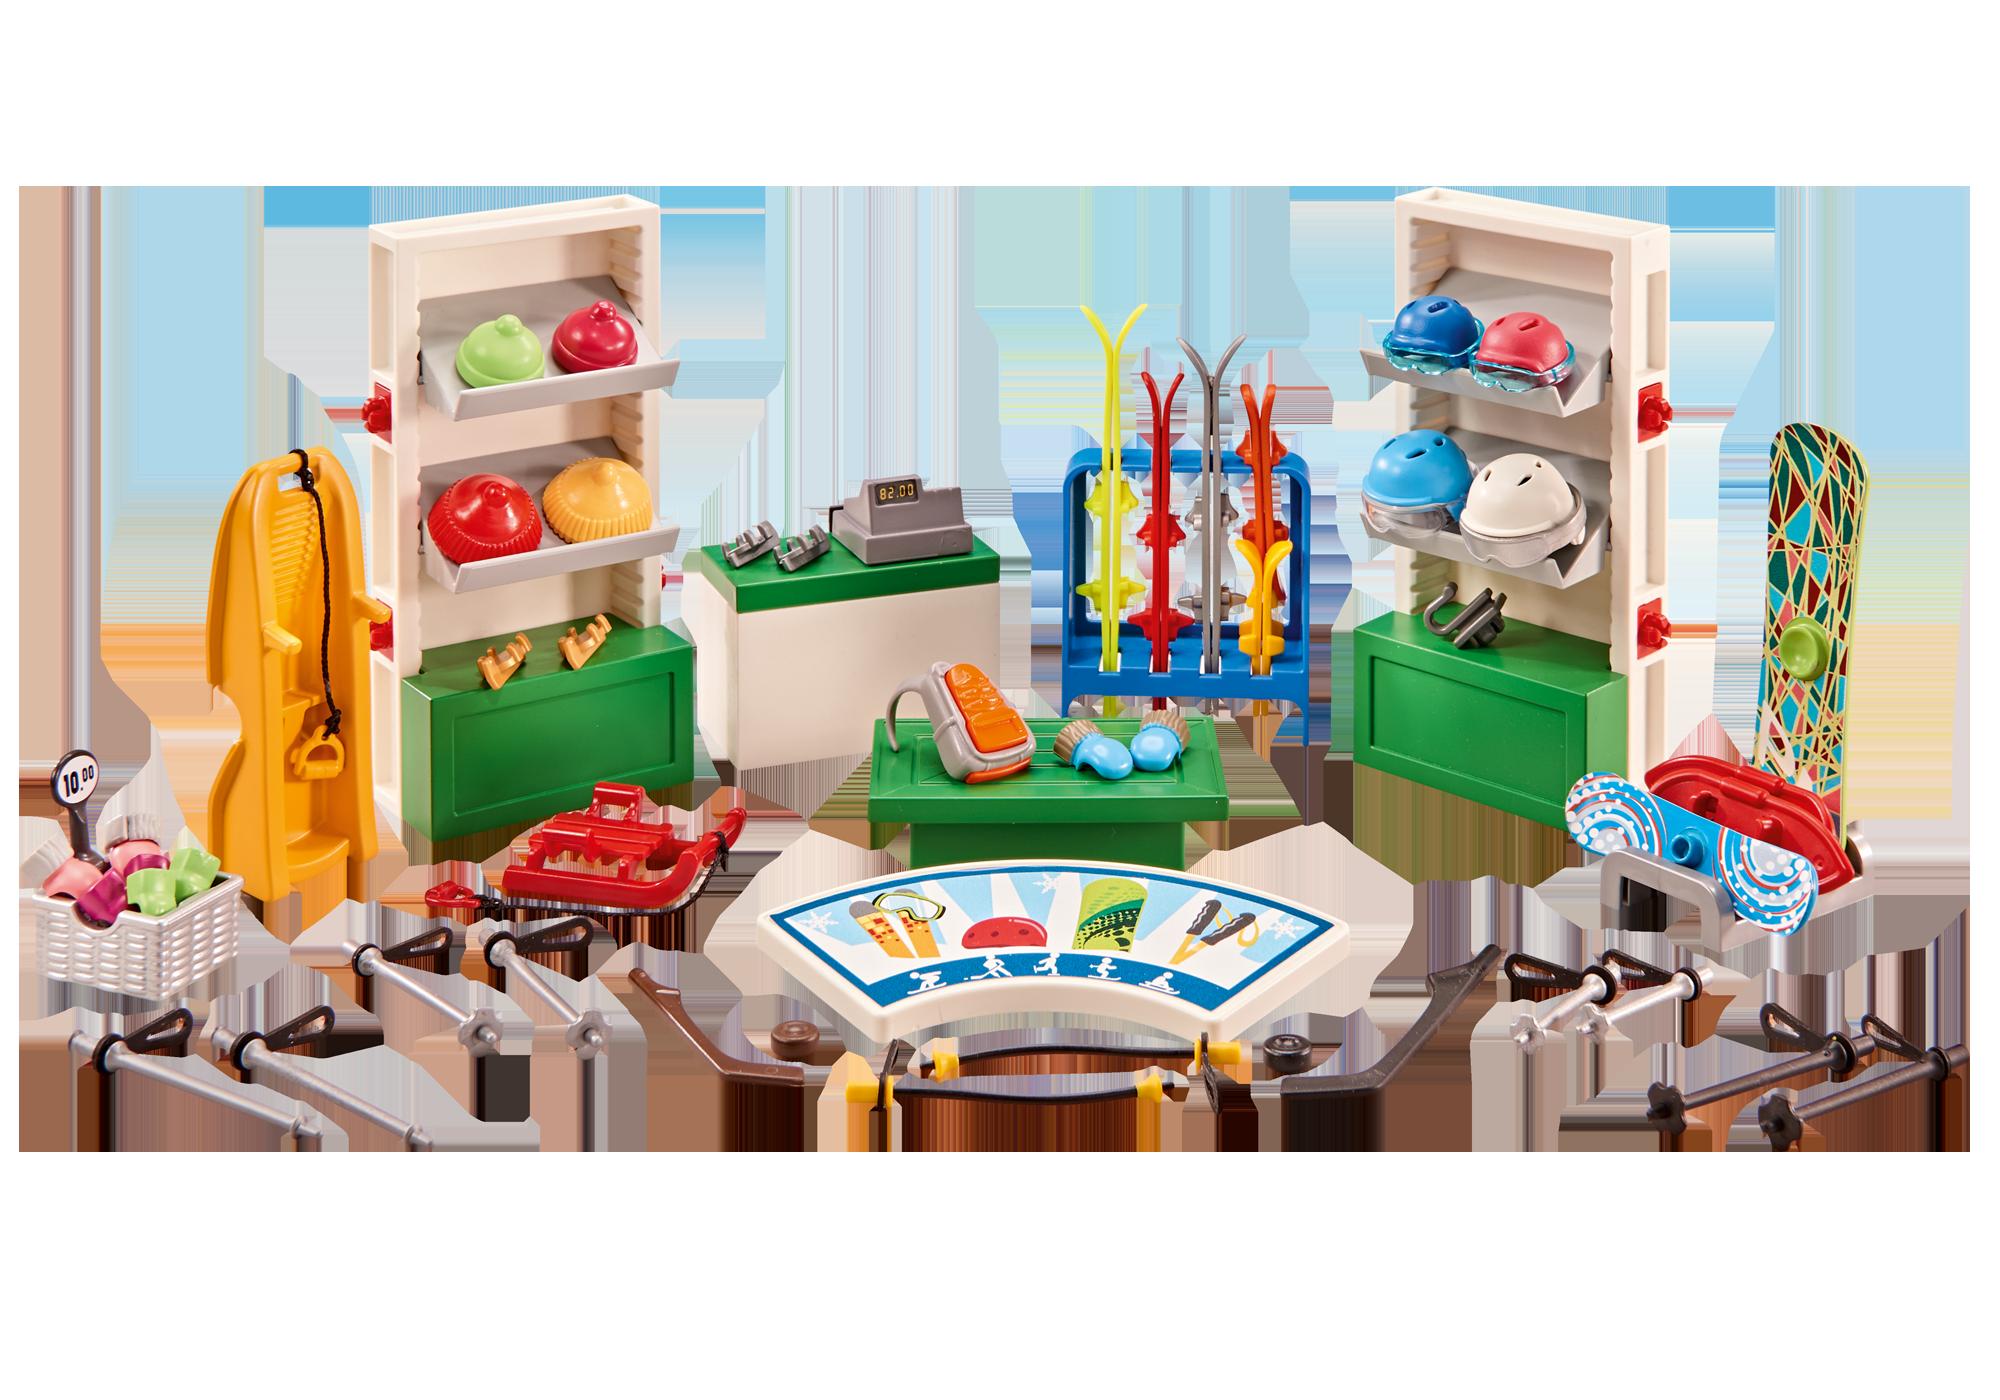 http://media.playmobil.com/i/playmobil/6570_product_detail